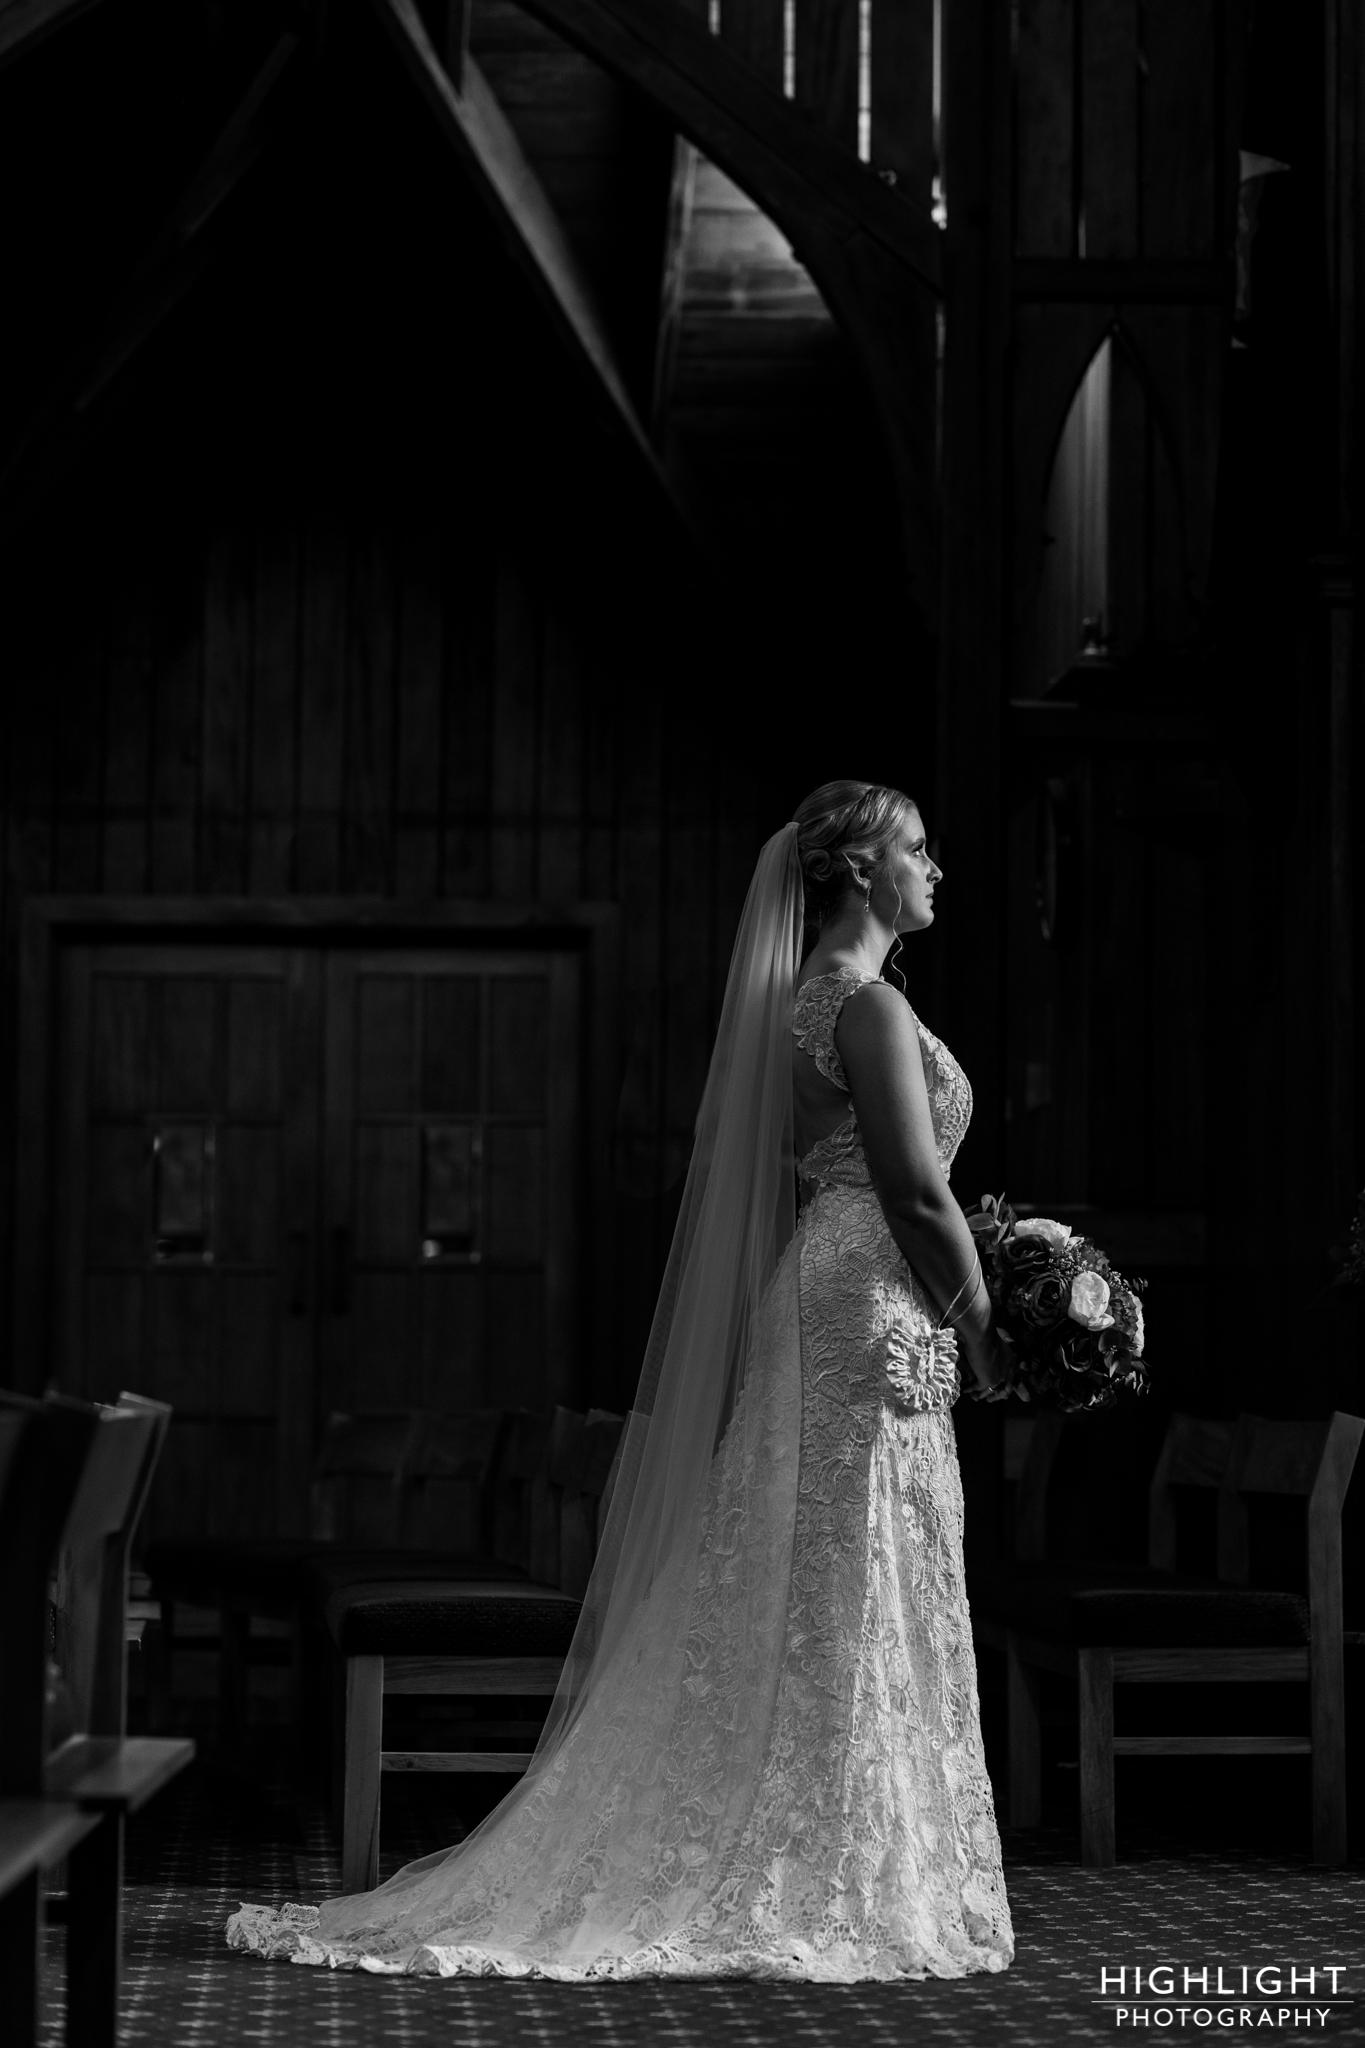 bw-highlight-wedding-photography-feilding-new-zealand-2.jpg